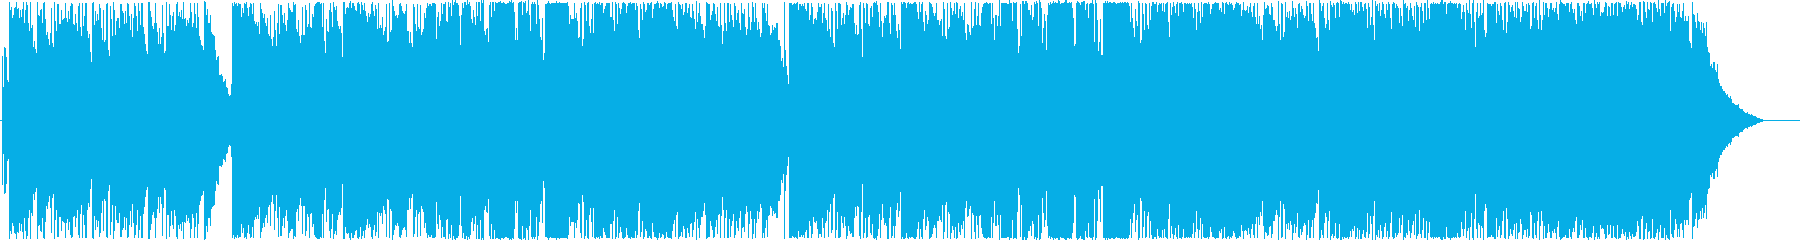 a prioriの再生済みの波形